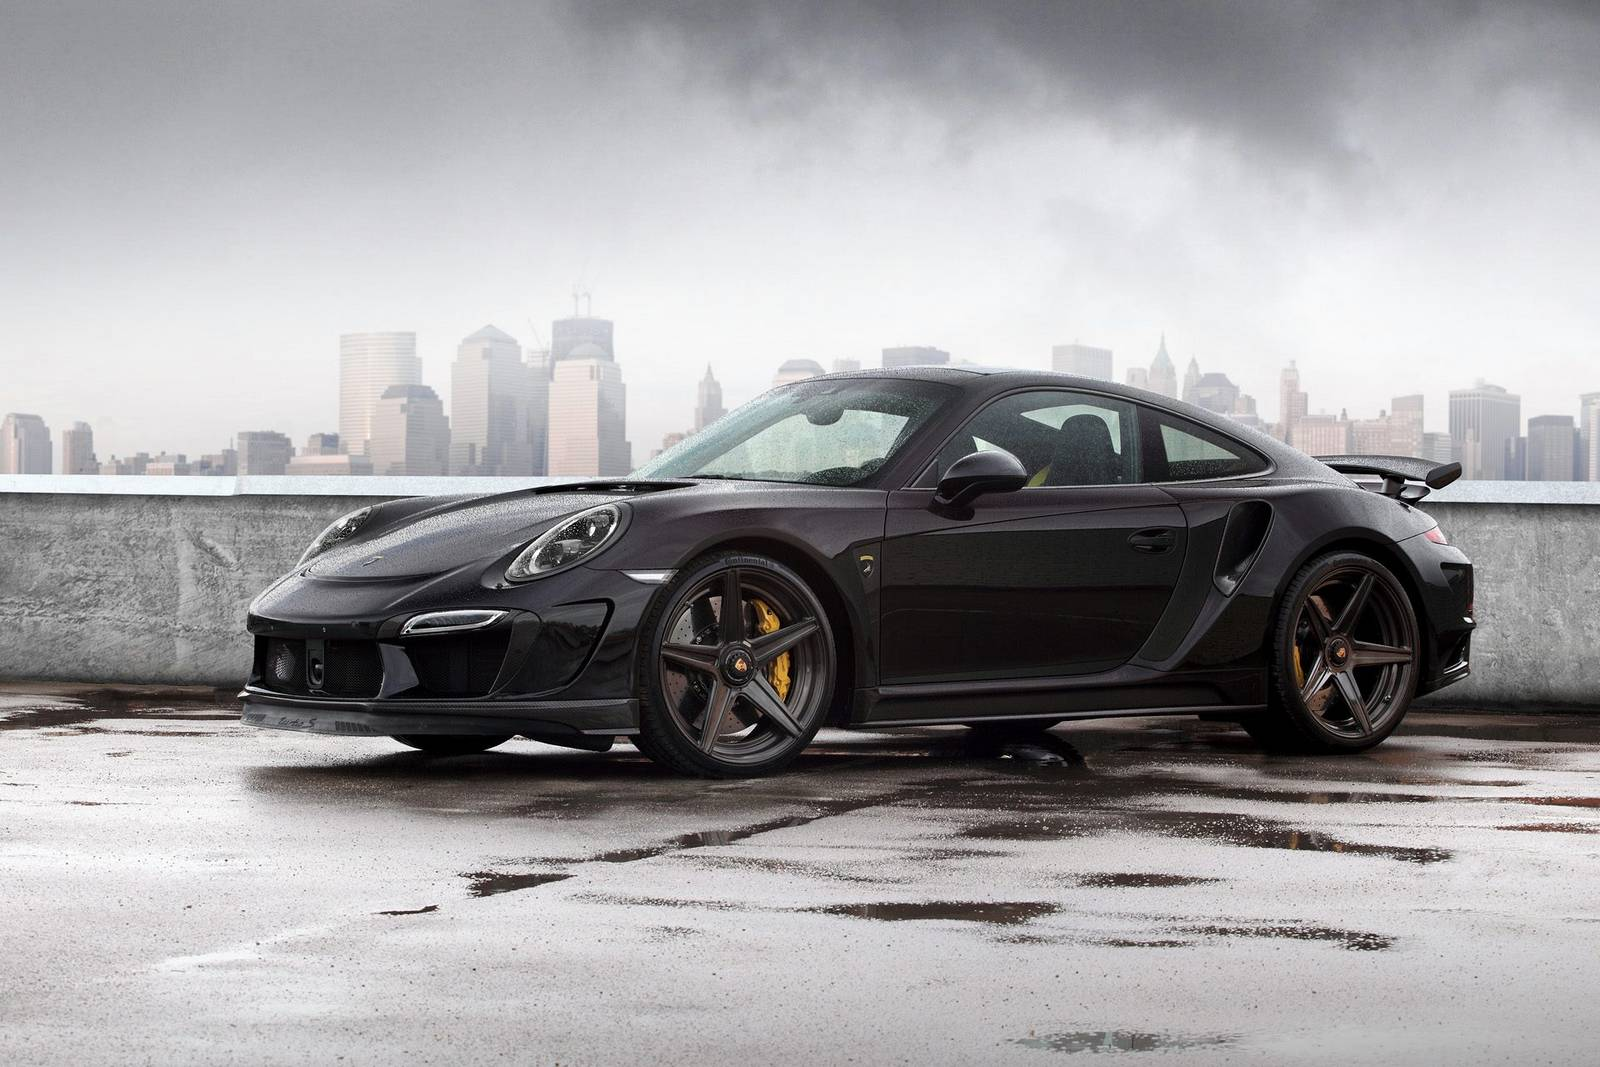 topcar reveals black porsche 911 stinger gtr - 911 Porsche Black